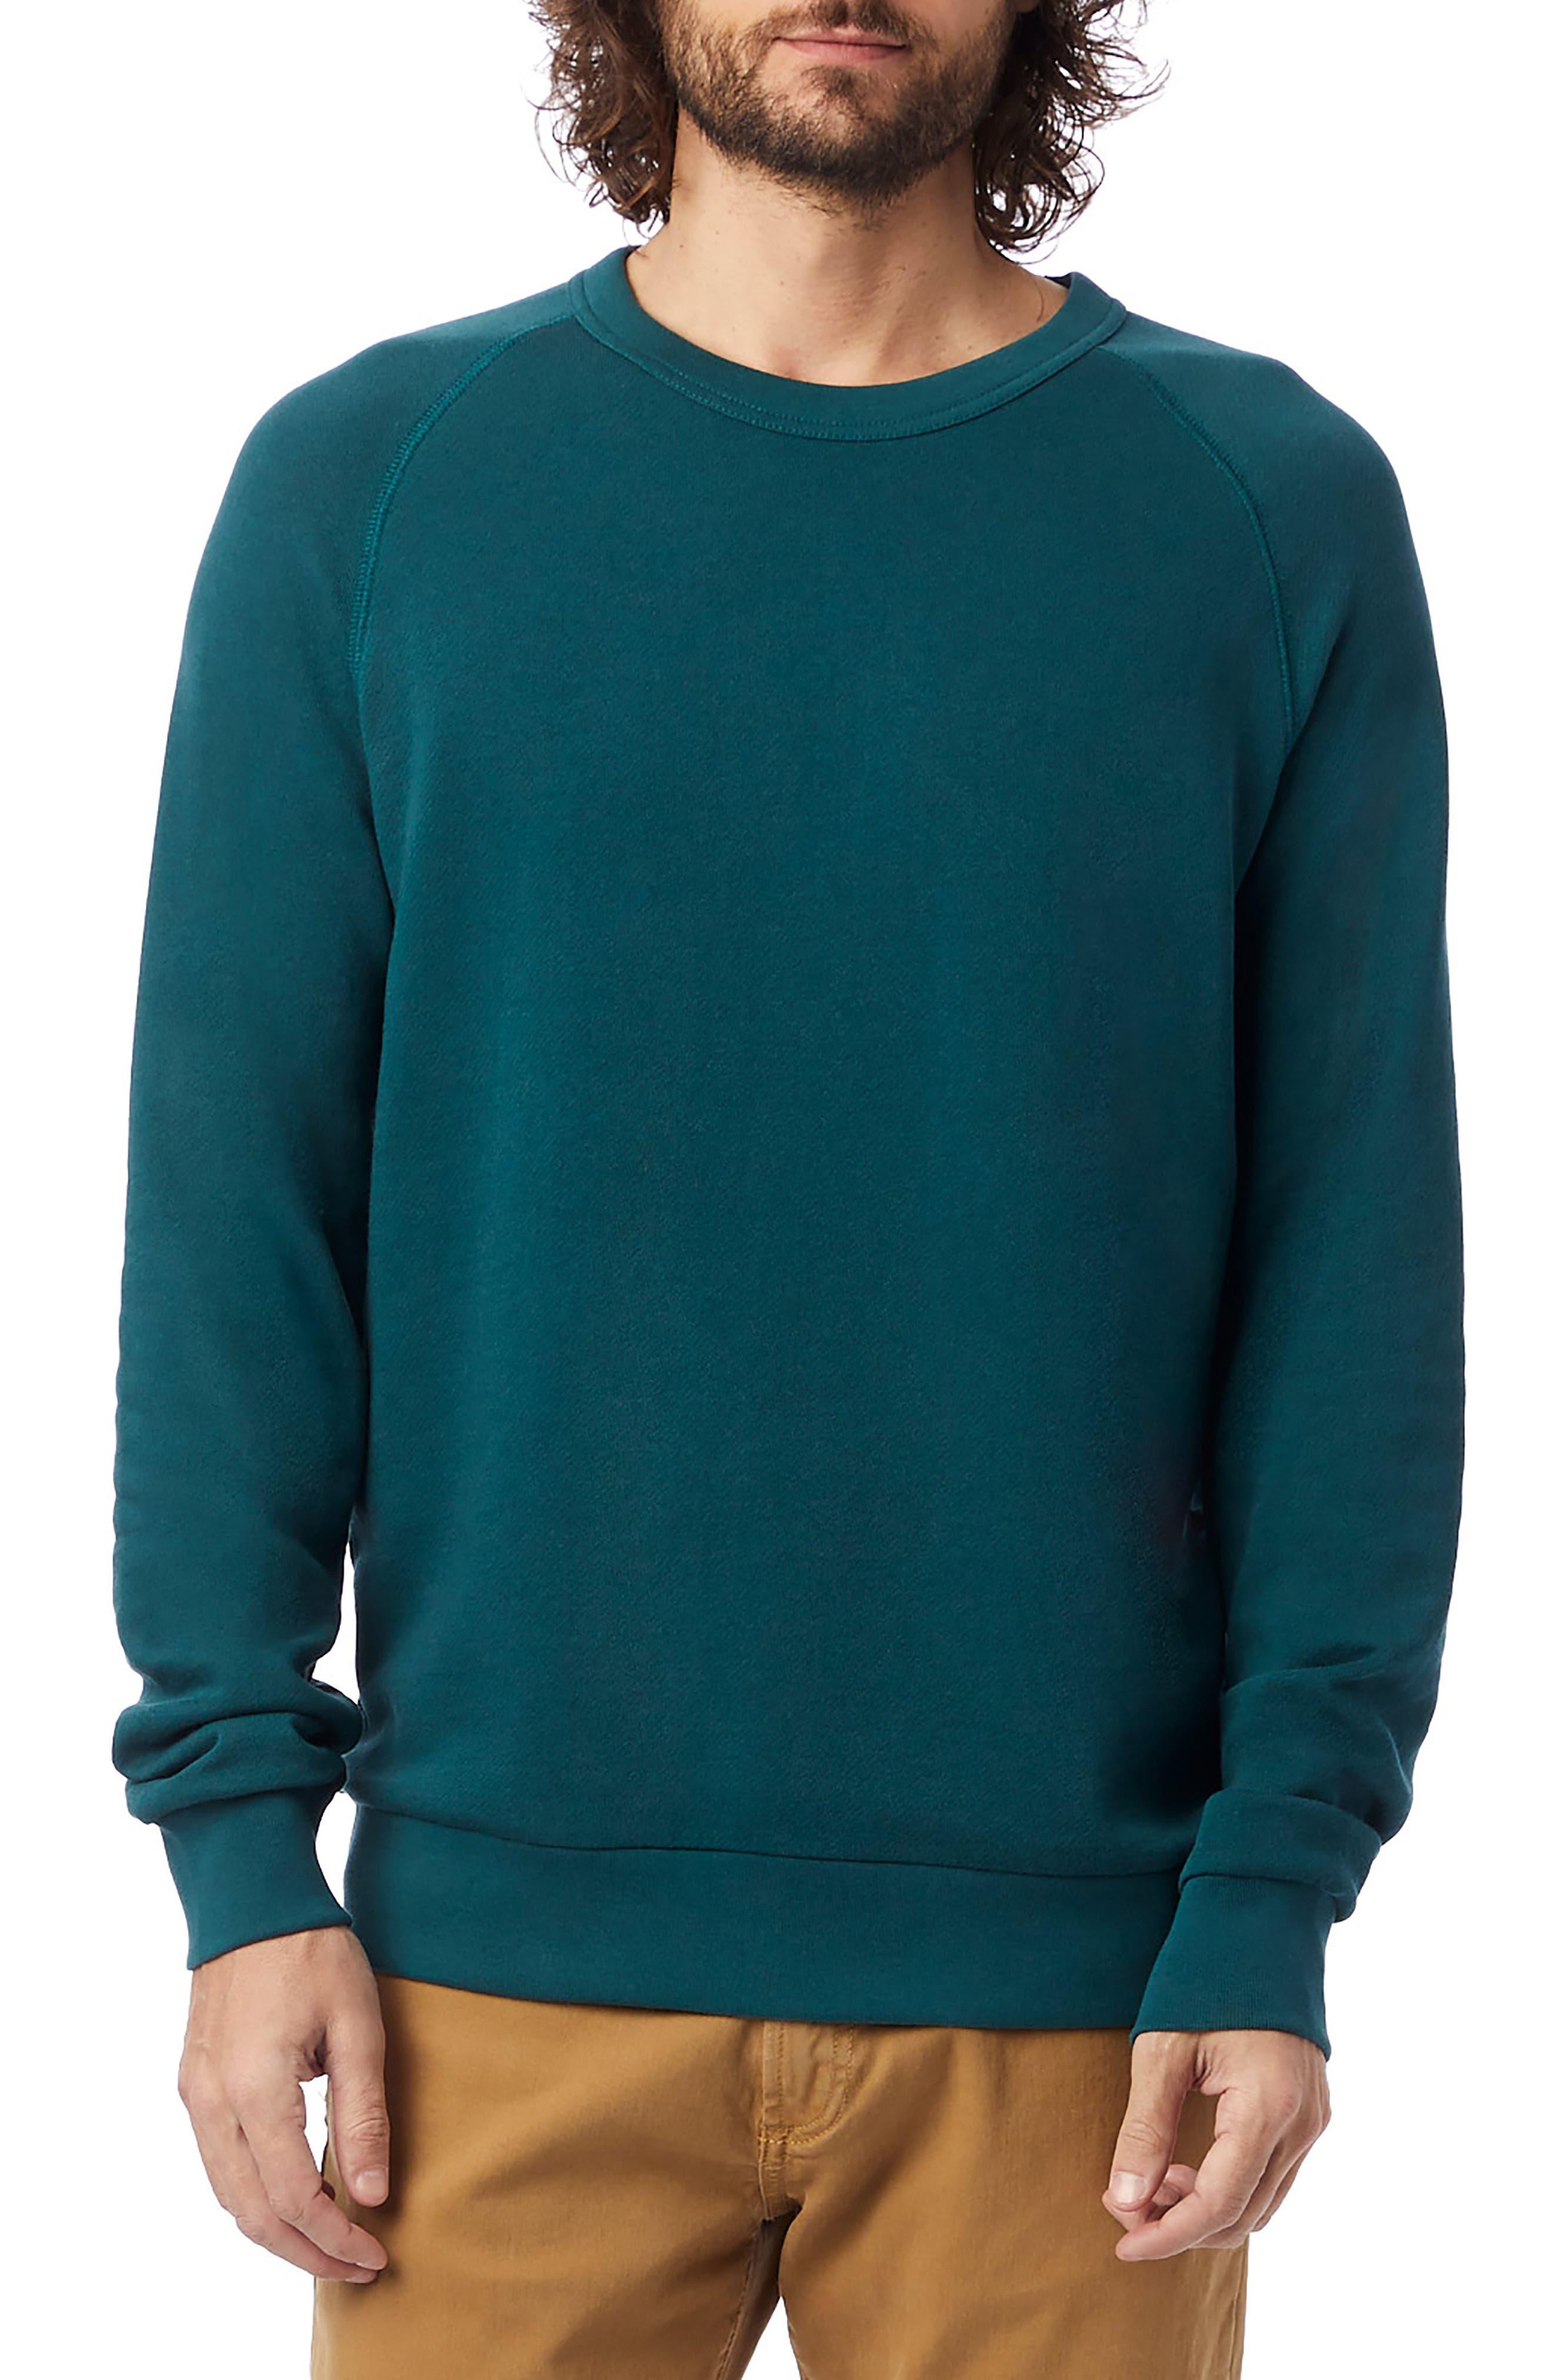 Champ Washed Terry Sweatshirt